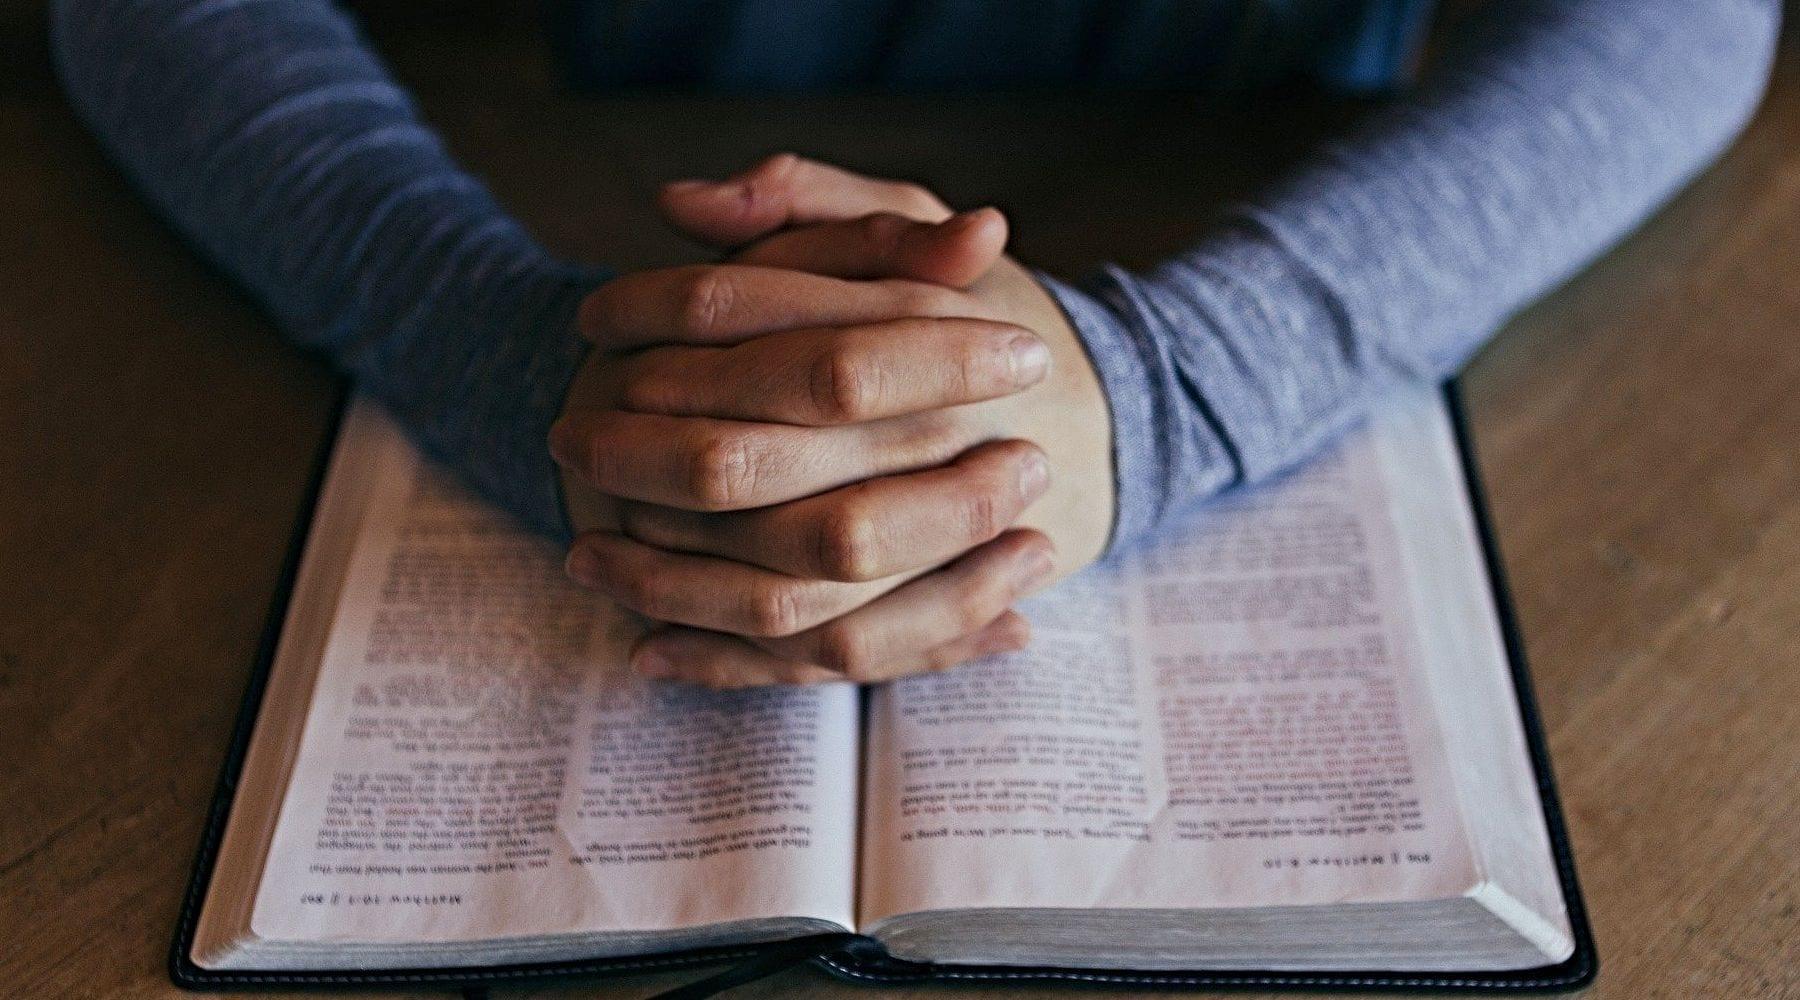 Who Needs Theologians During Global Coronavirus Crisis?